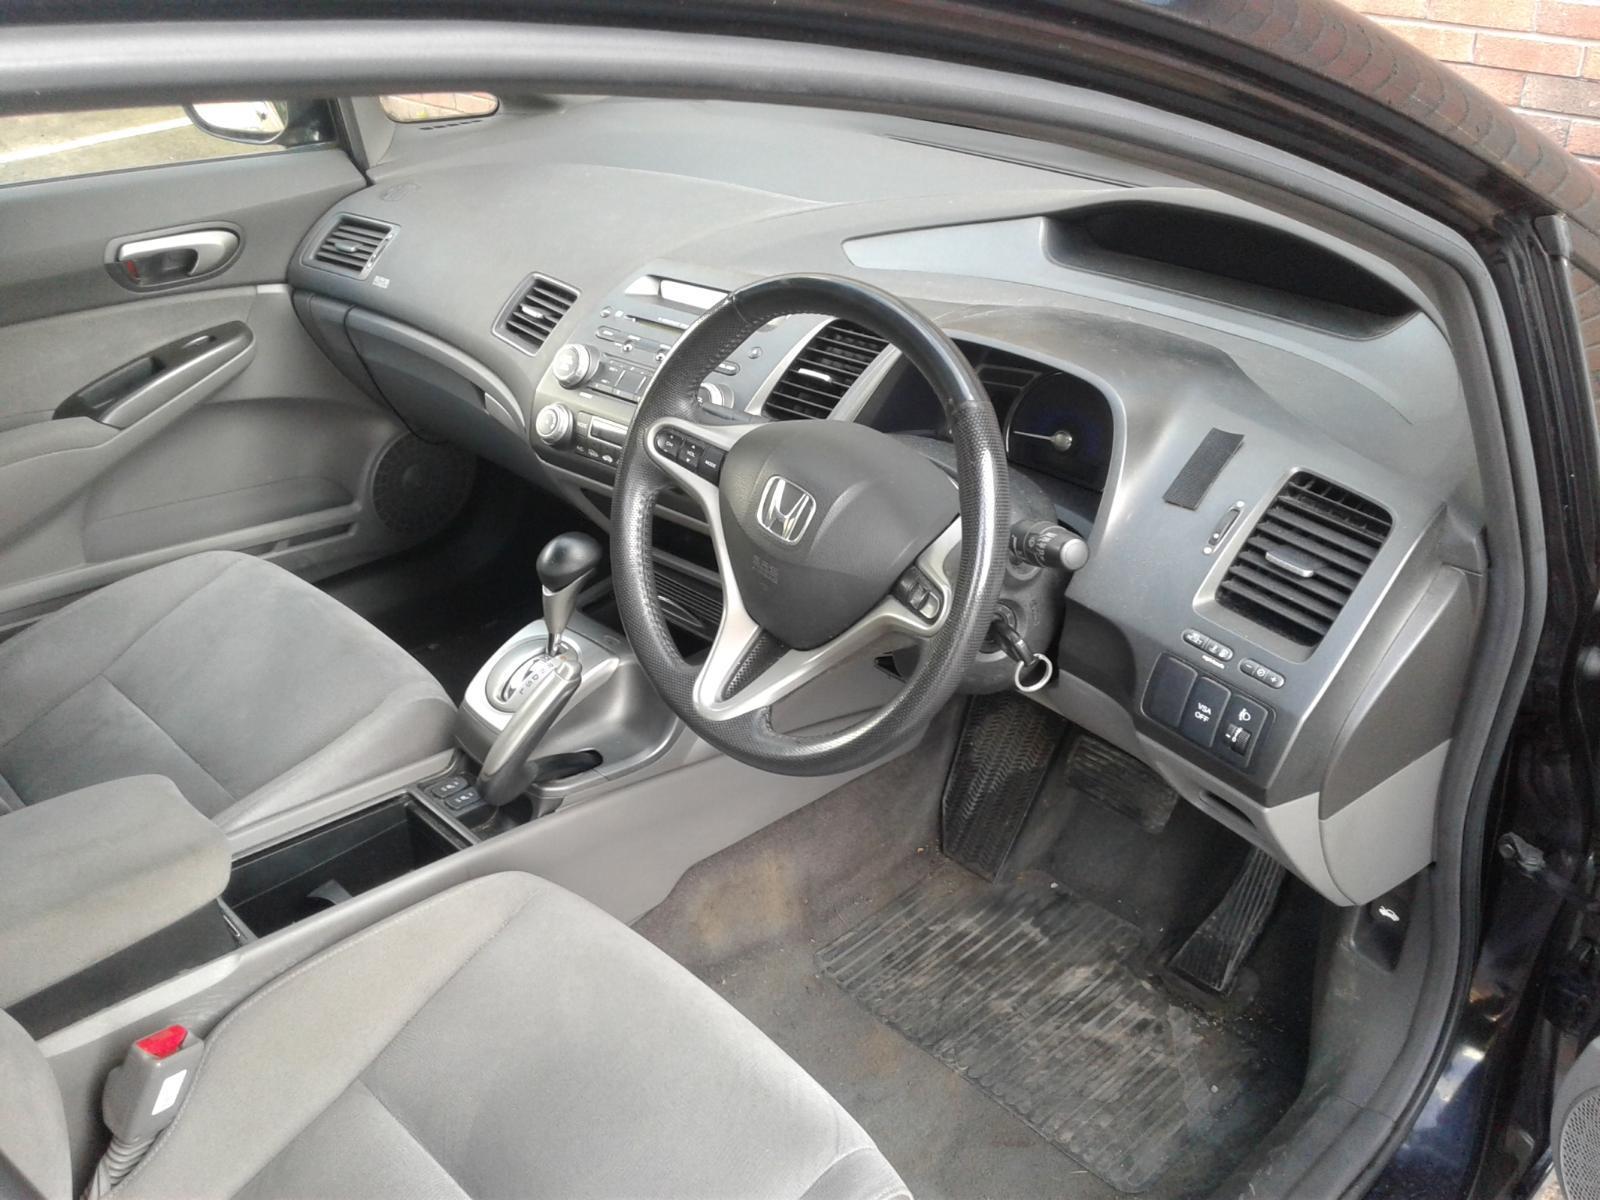 2007 HONDA CIVIC Image